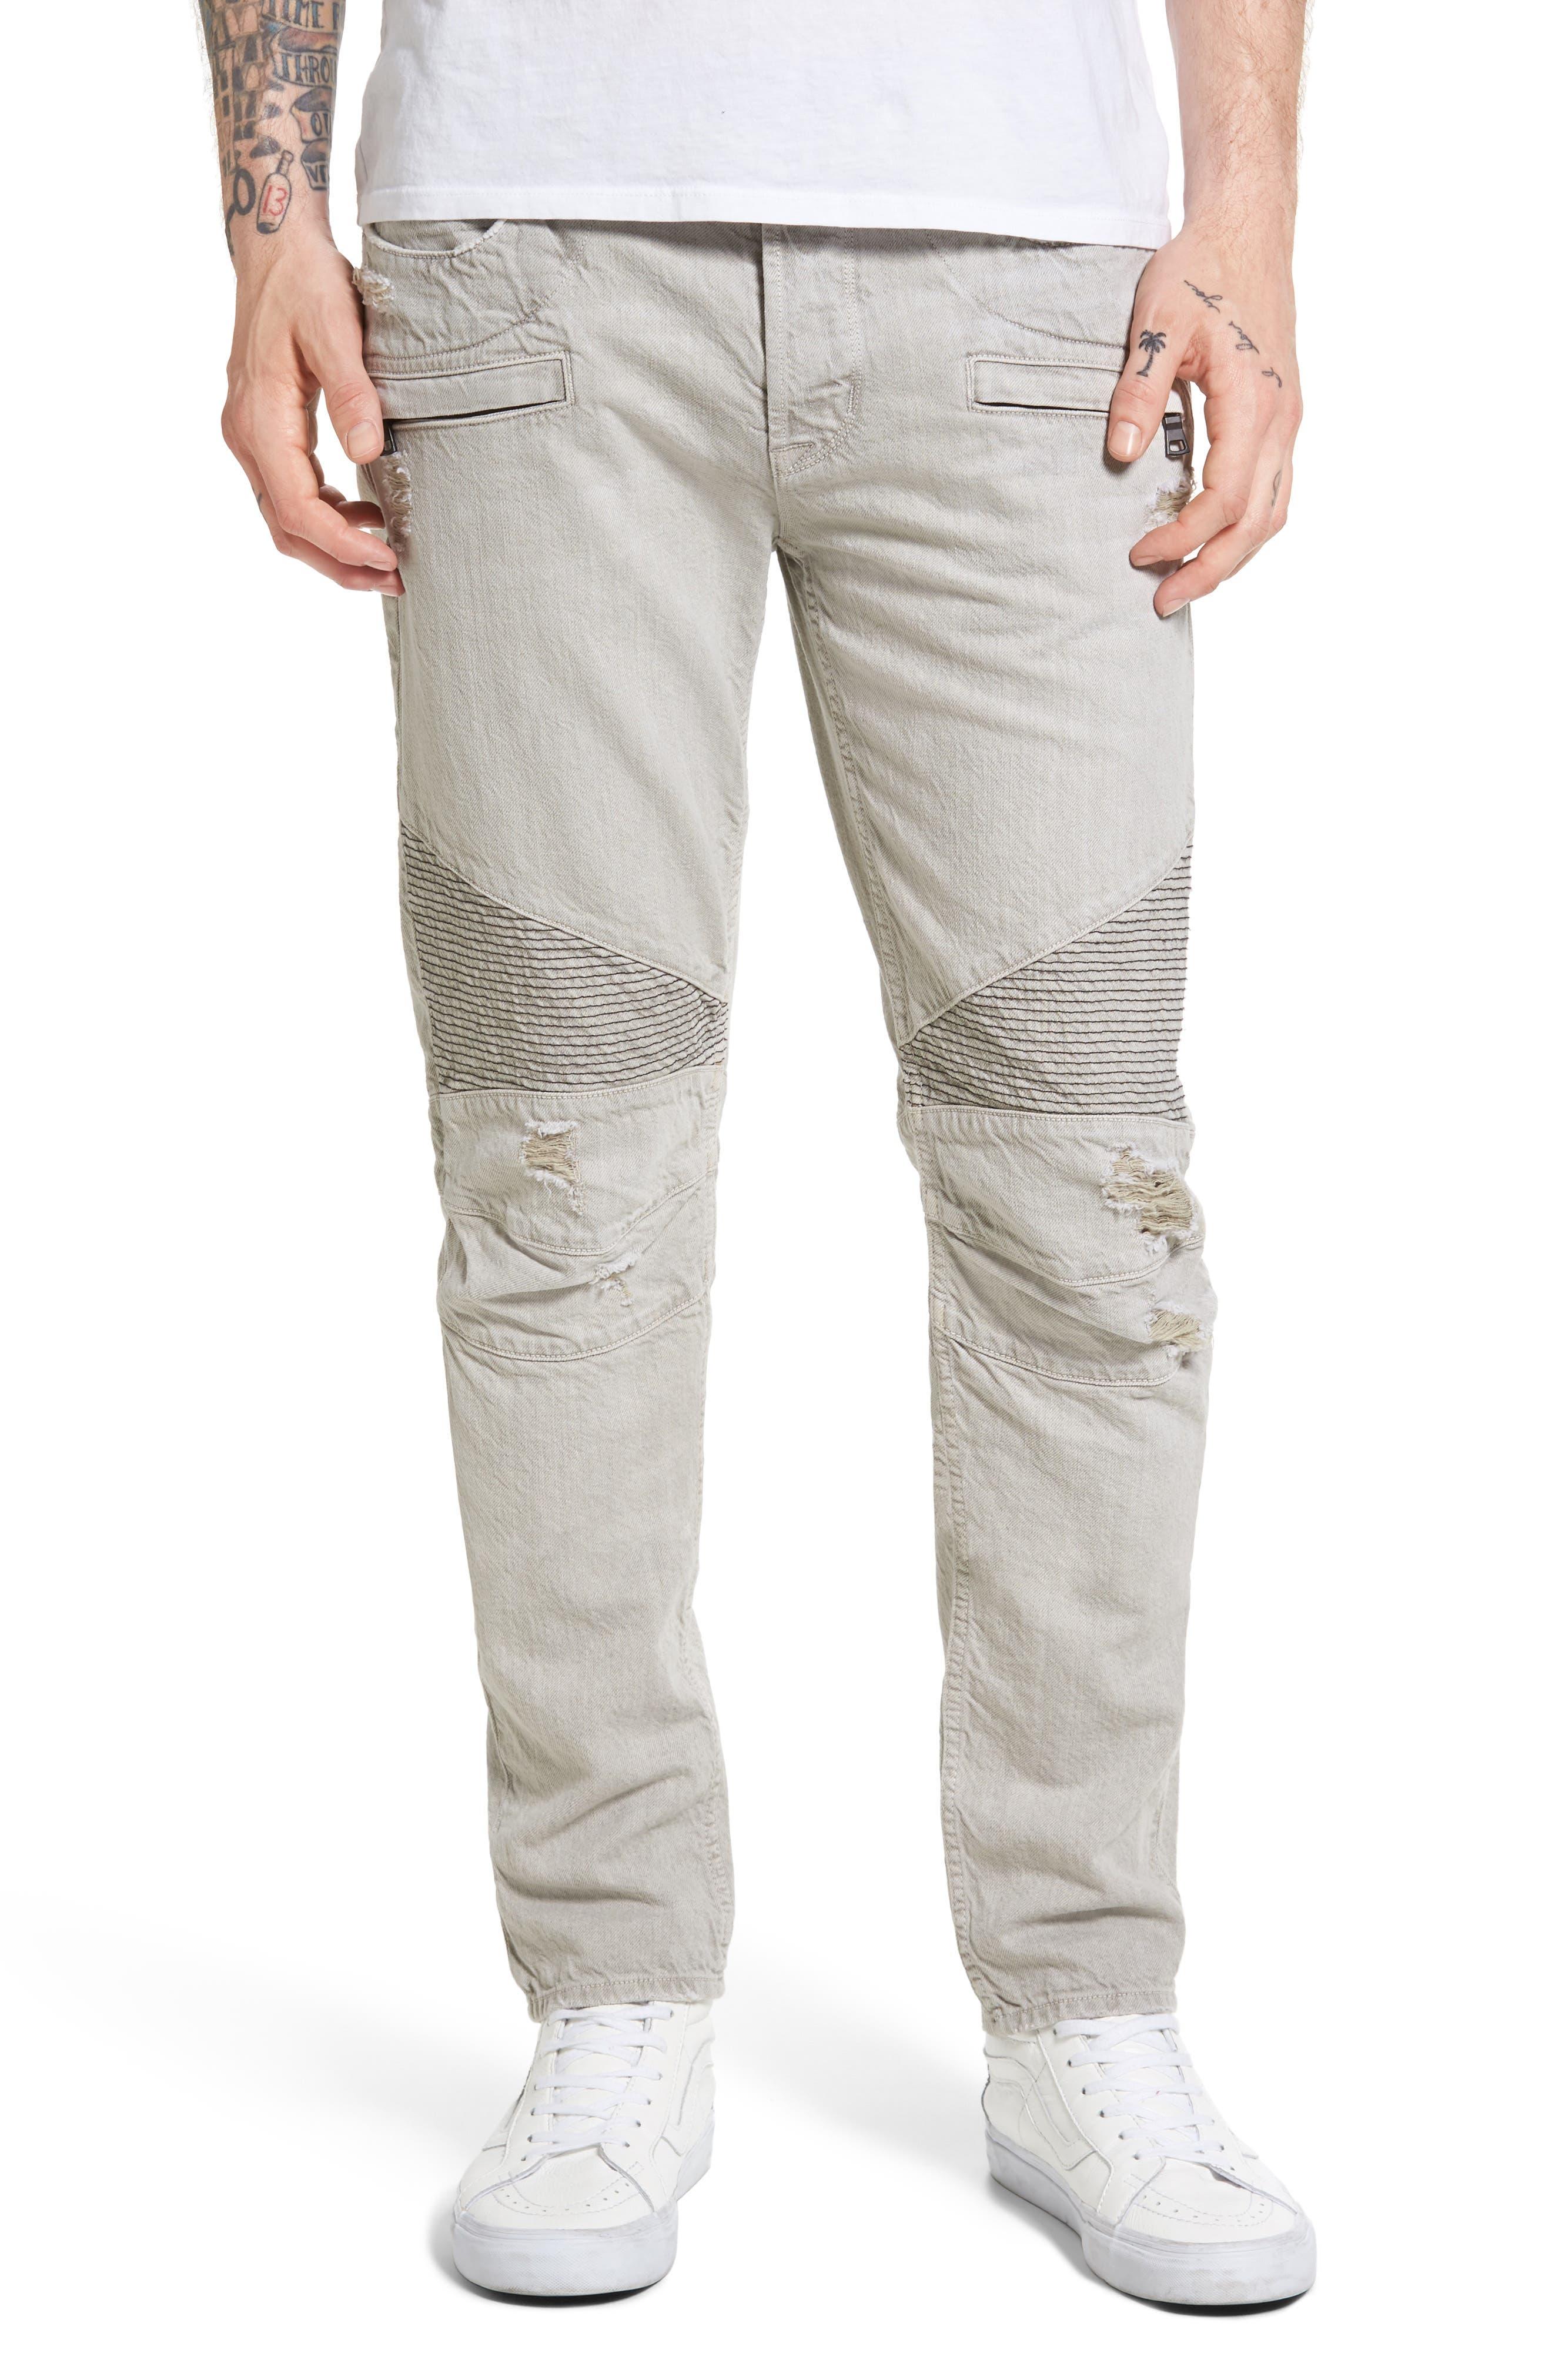 Main Image - Hudson Jeans Blinder Biker Skinny Fit Jeans (Adherence)